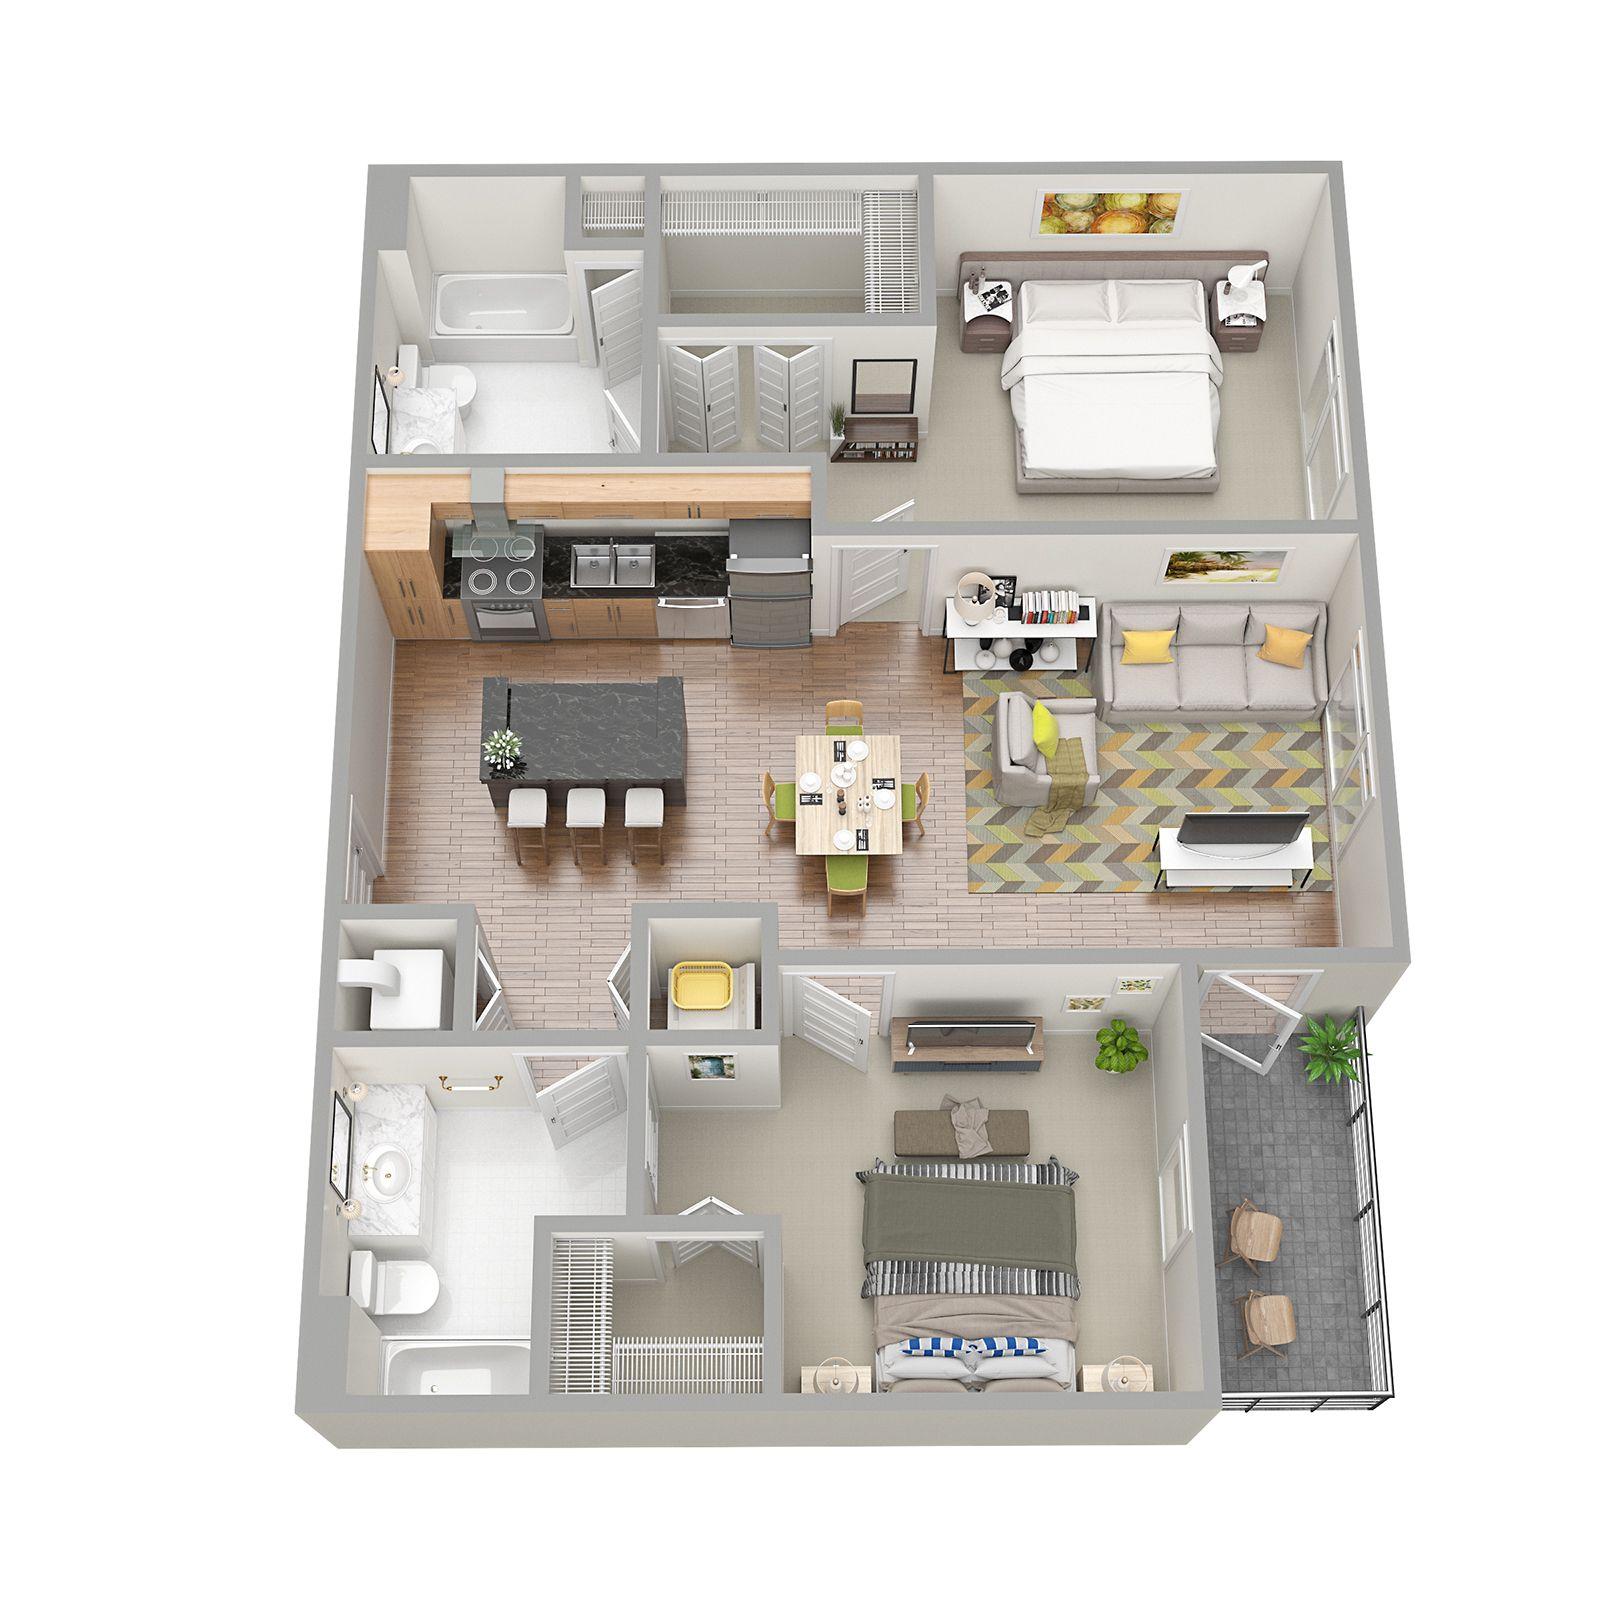 3d Floor Plans House Floor Plans Sims 4 House Plans Small Floor Plans